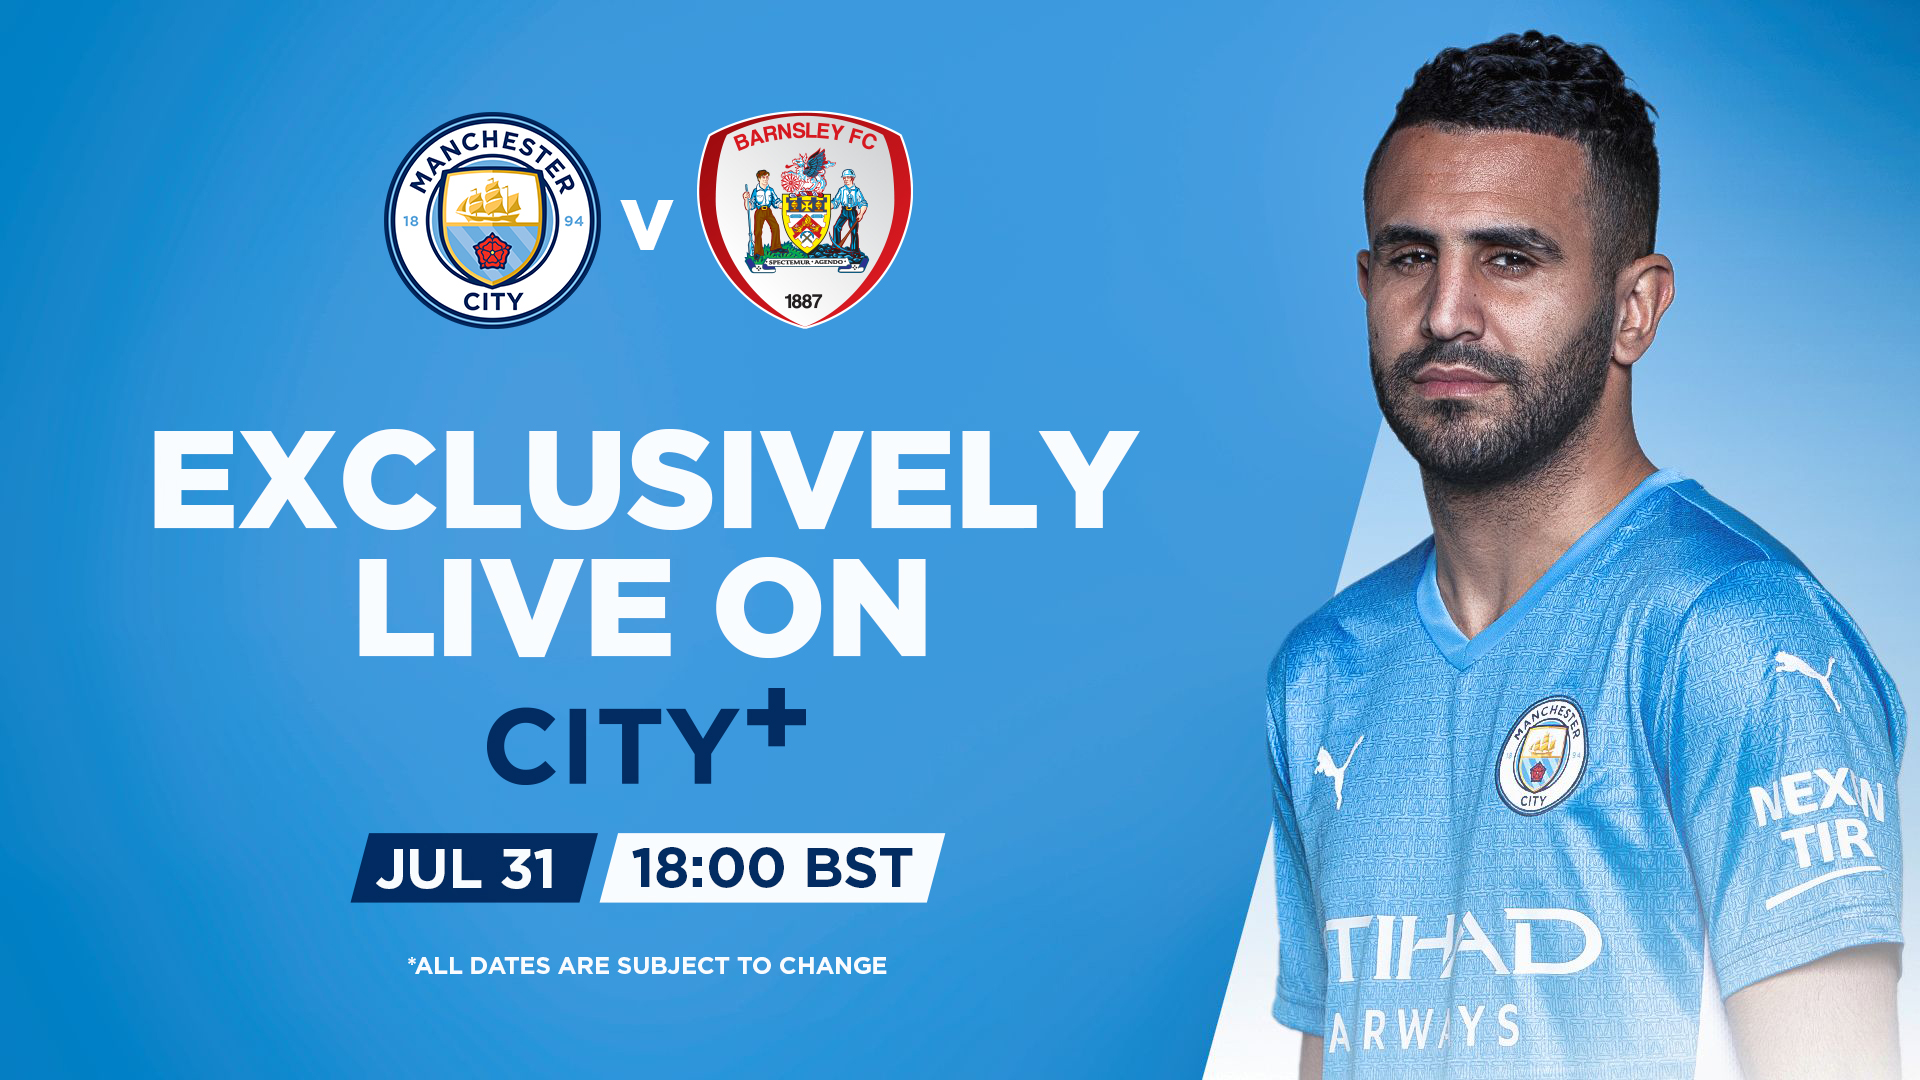 Manchester City vs Preston North End Full Match & Highlights 27 July 2021